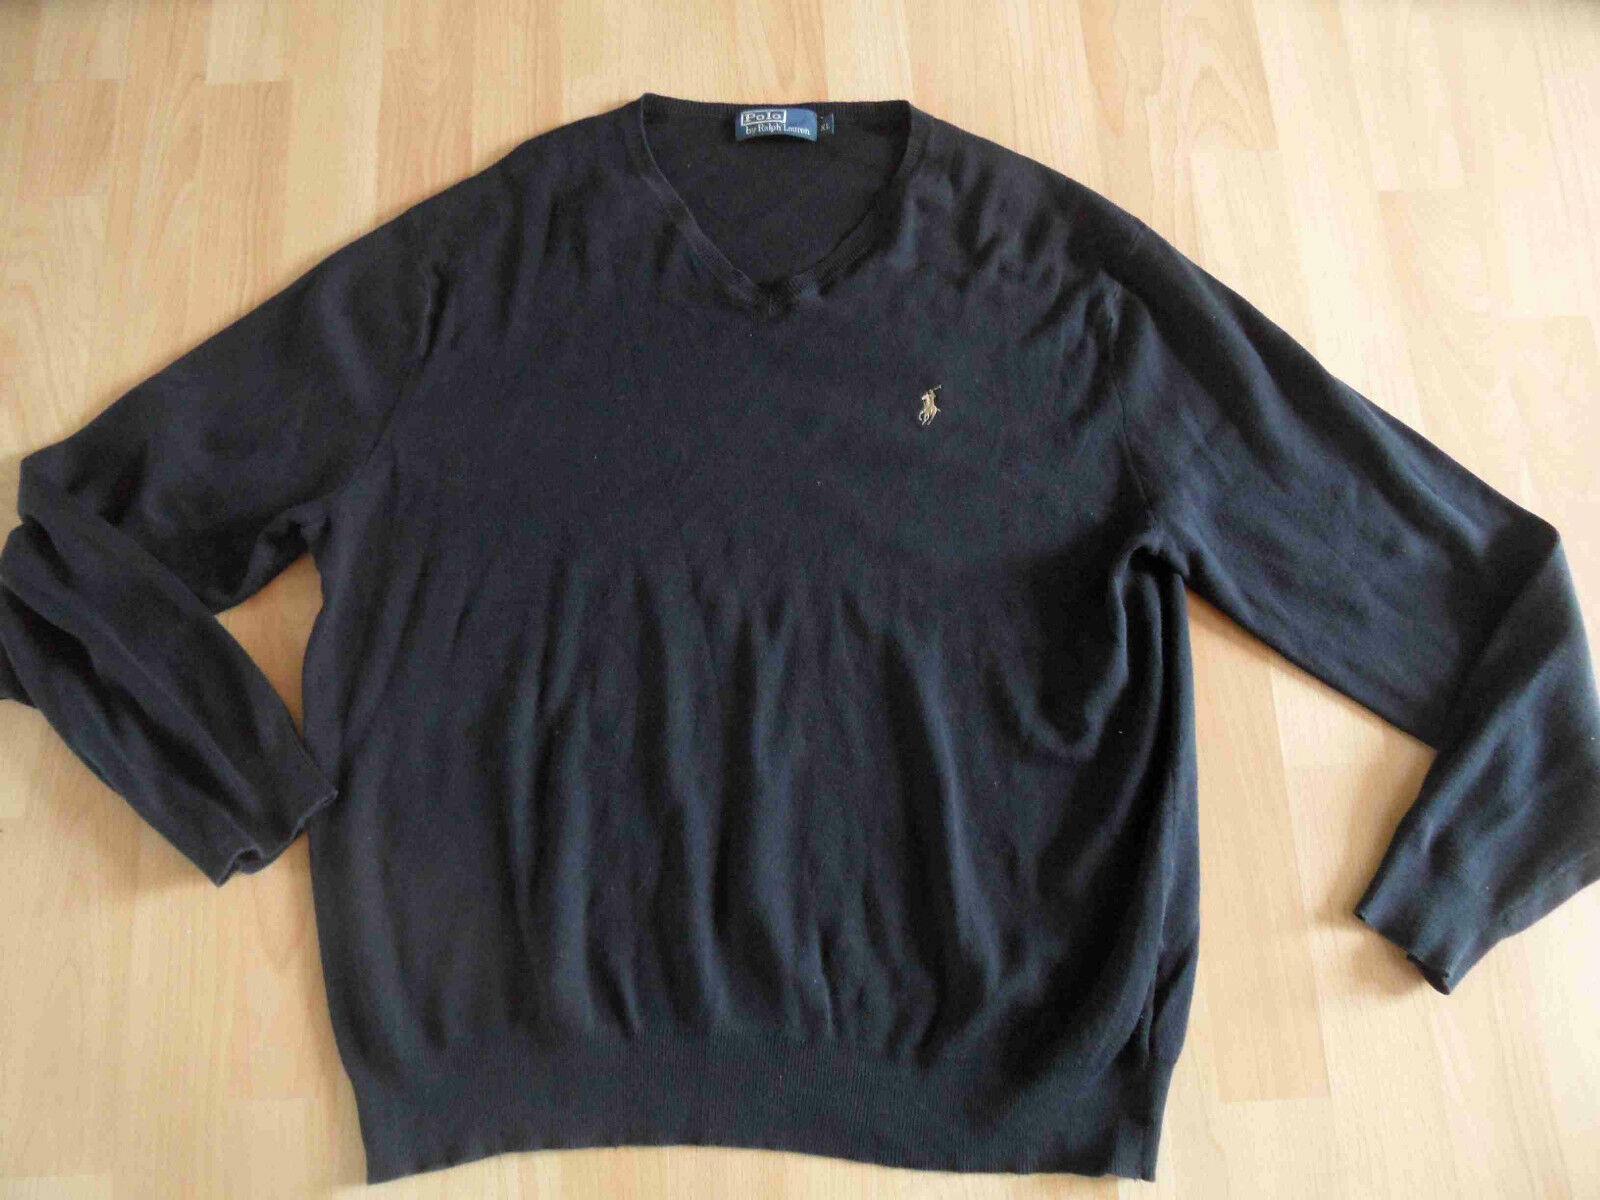 RALPH LAUREN schöner Basic Pullover schwarz m. V-Ausschnitt Gr. XL TOP 07-13